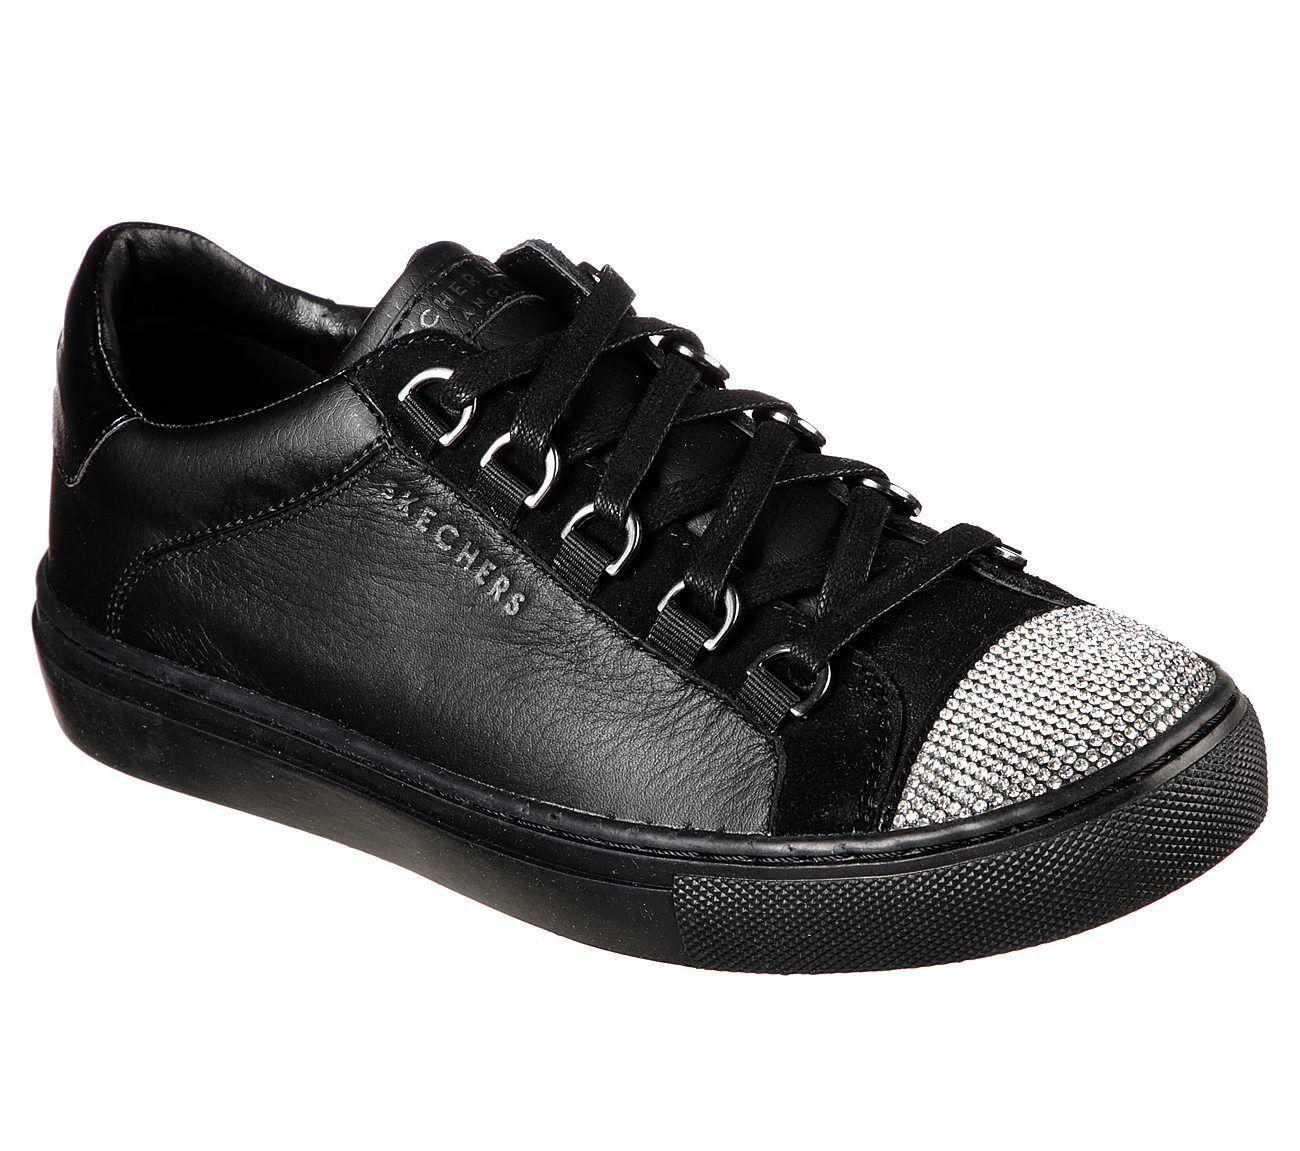 Bling Street Sneaker Shoe Black